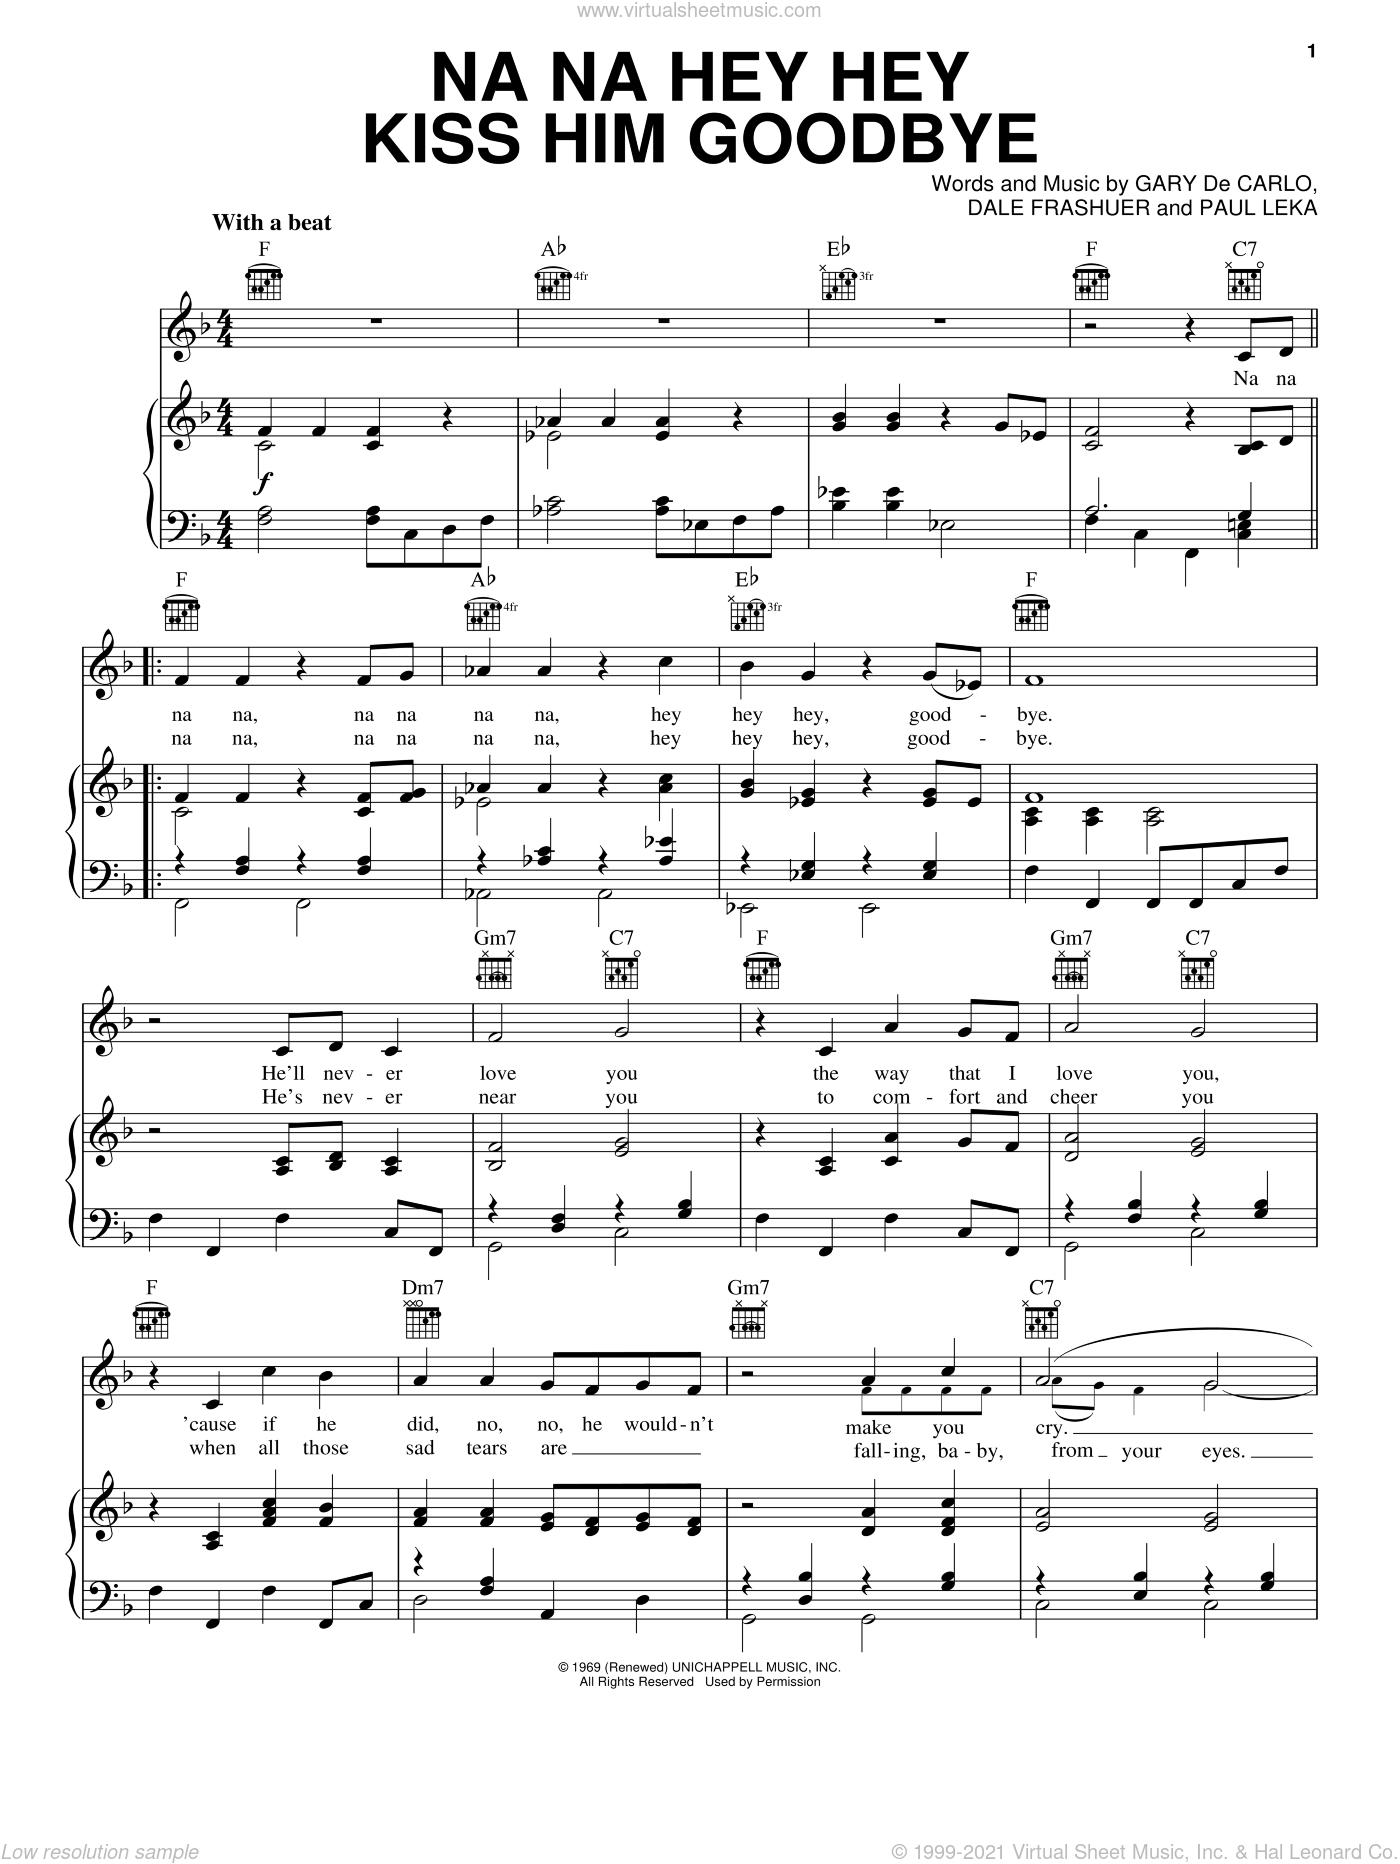 Na Na Hey Hey Kiss Him Goodbye sheet music for voice, piano or guitar by Steam, Arthur Frashuer Dale, Gary Carla and Paul Leka, intermediate skill level